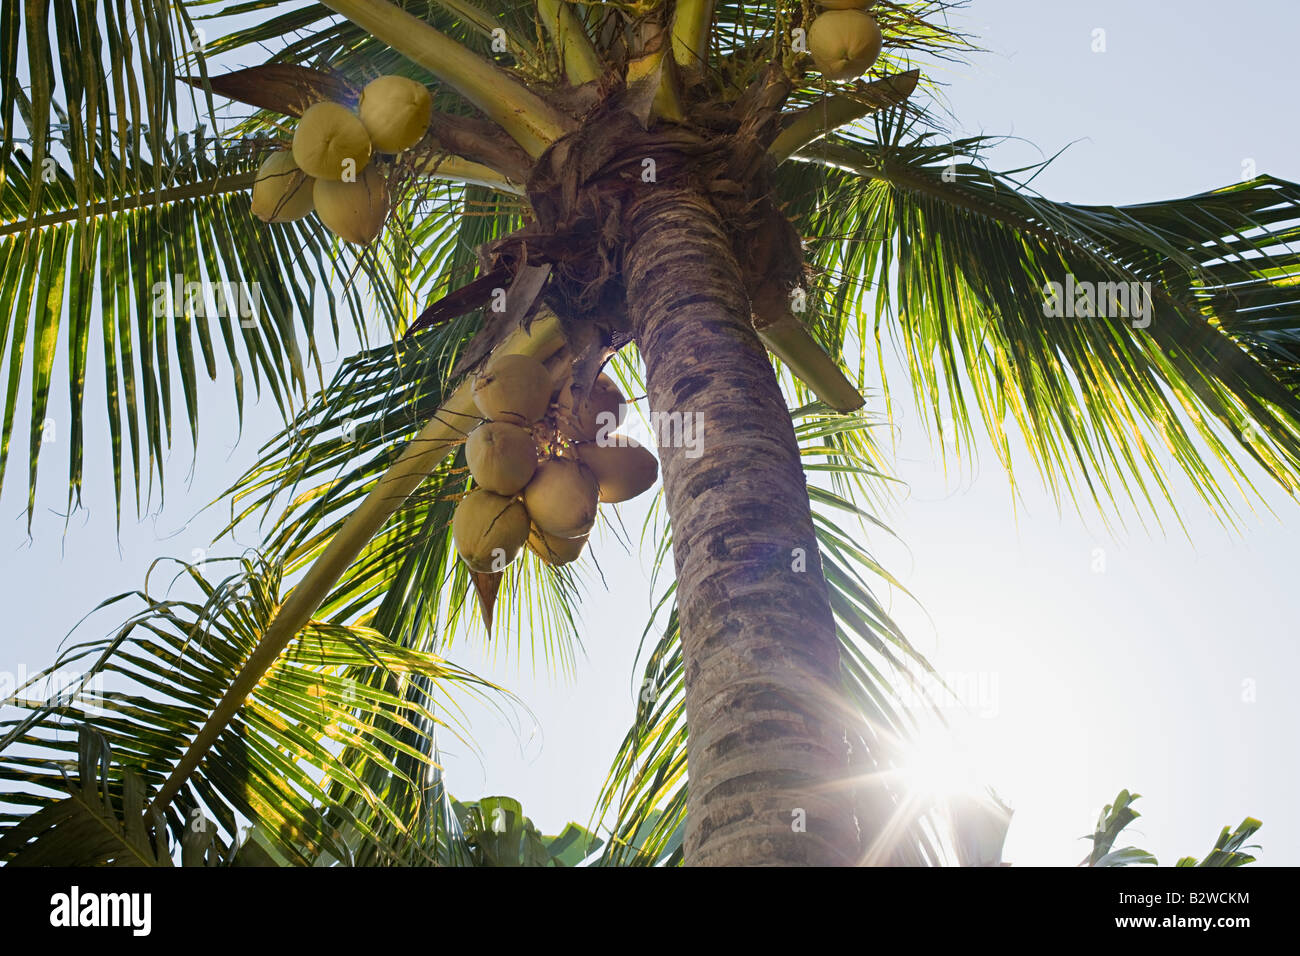 Coconut palm tree - Stock Image